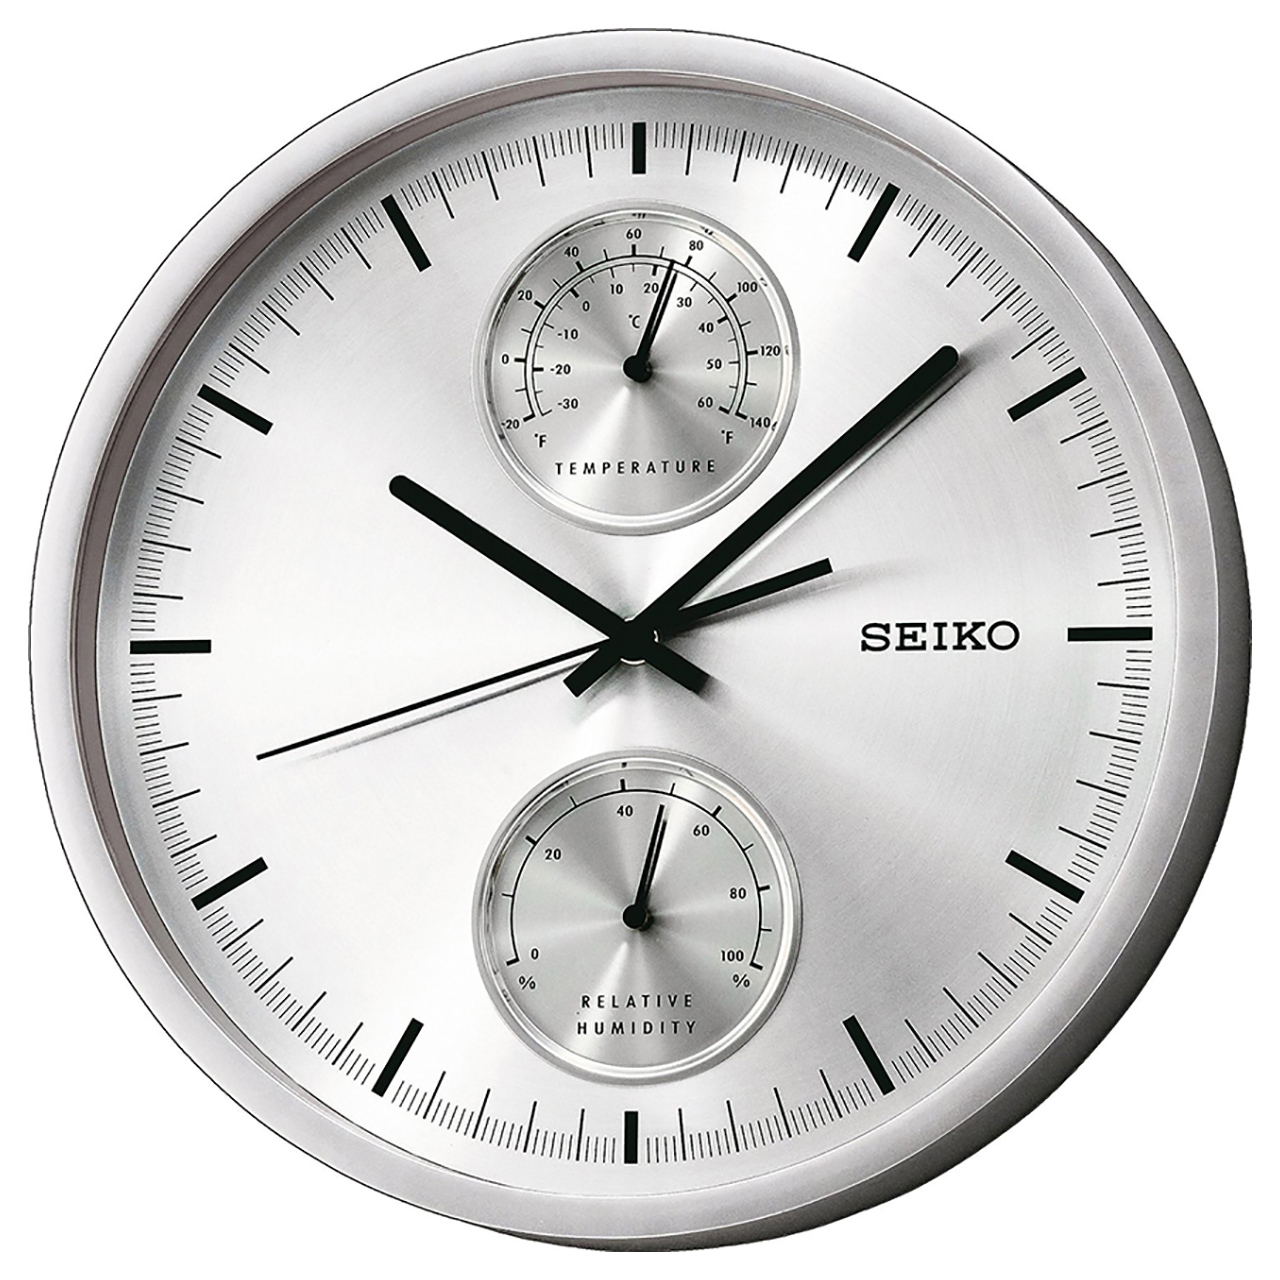 خرید ساعت دیواری سیکو مدل QXA525S | ساعت مچی